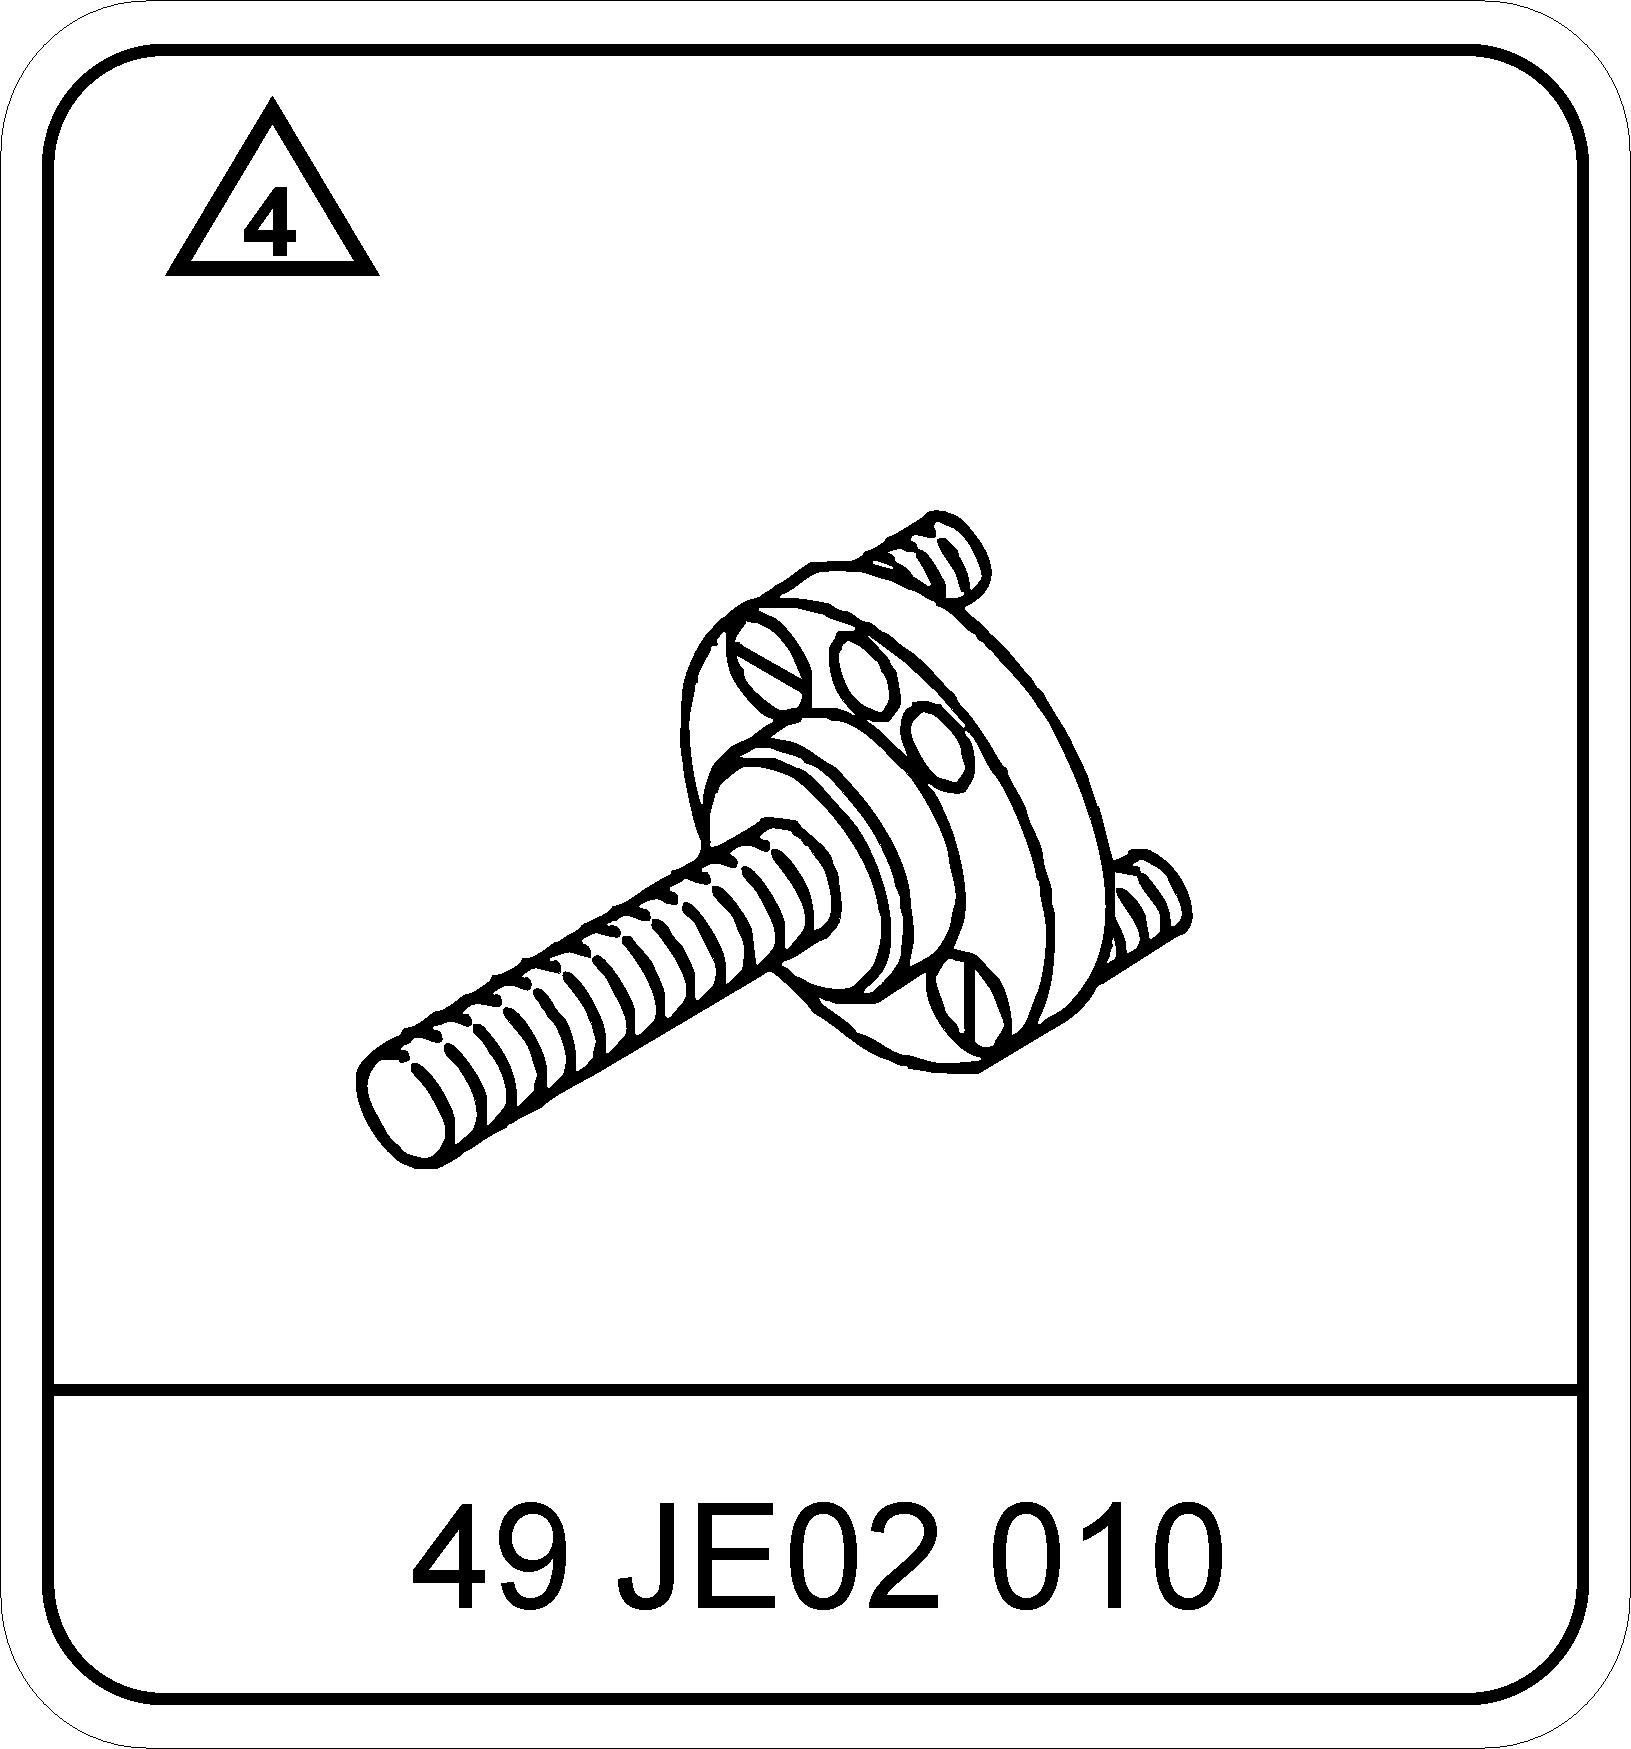 49-je02-010.png